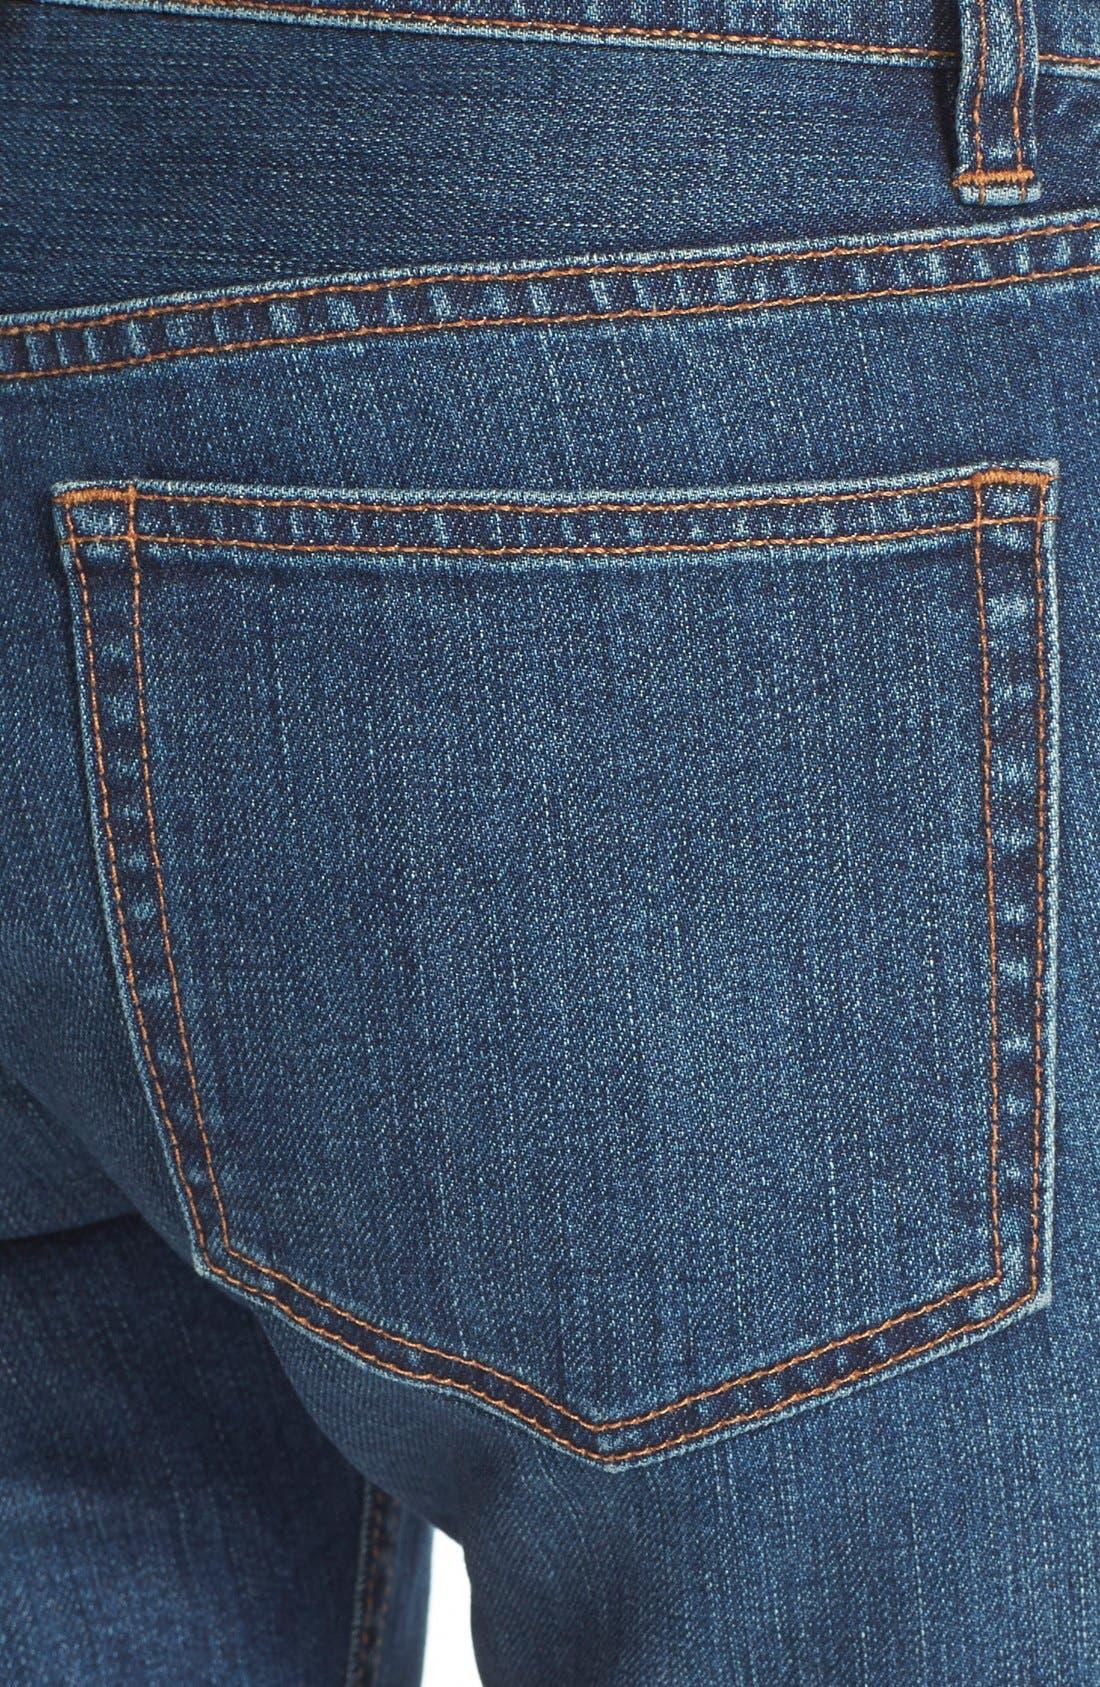 Alternate Image 3  - MARC BY MARC JACOBS Slim Crop Boyfriend Jeans (Vintage Blue)